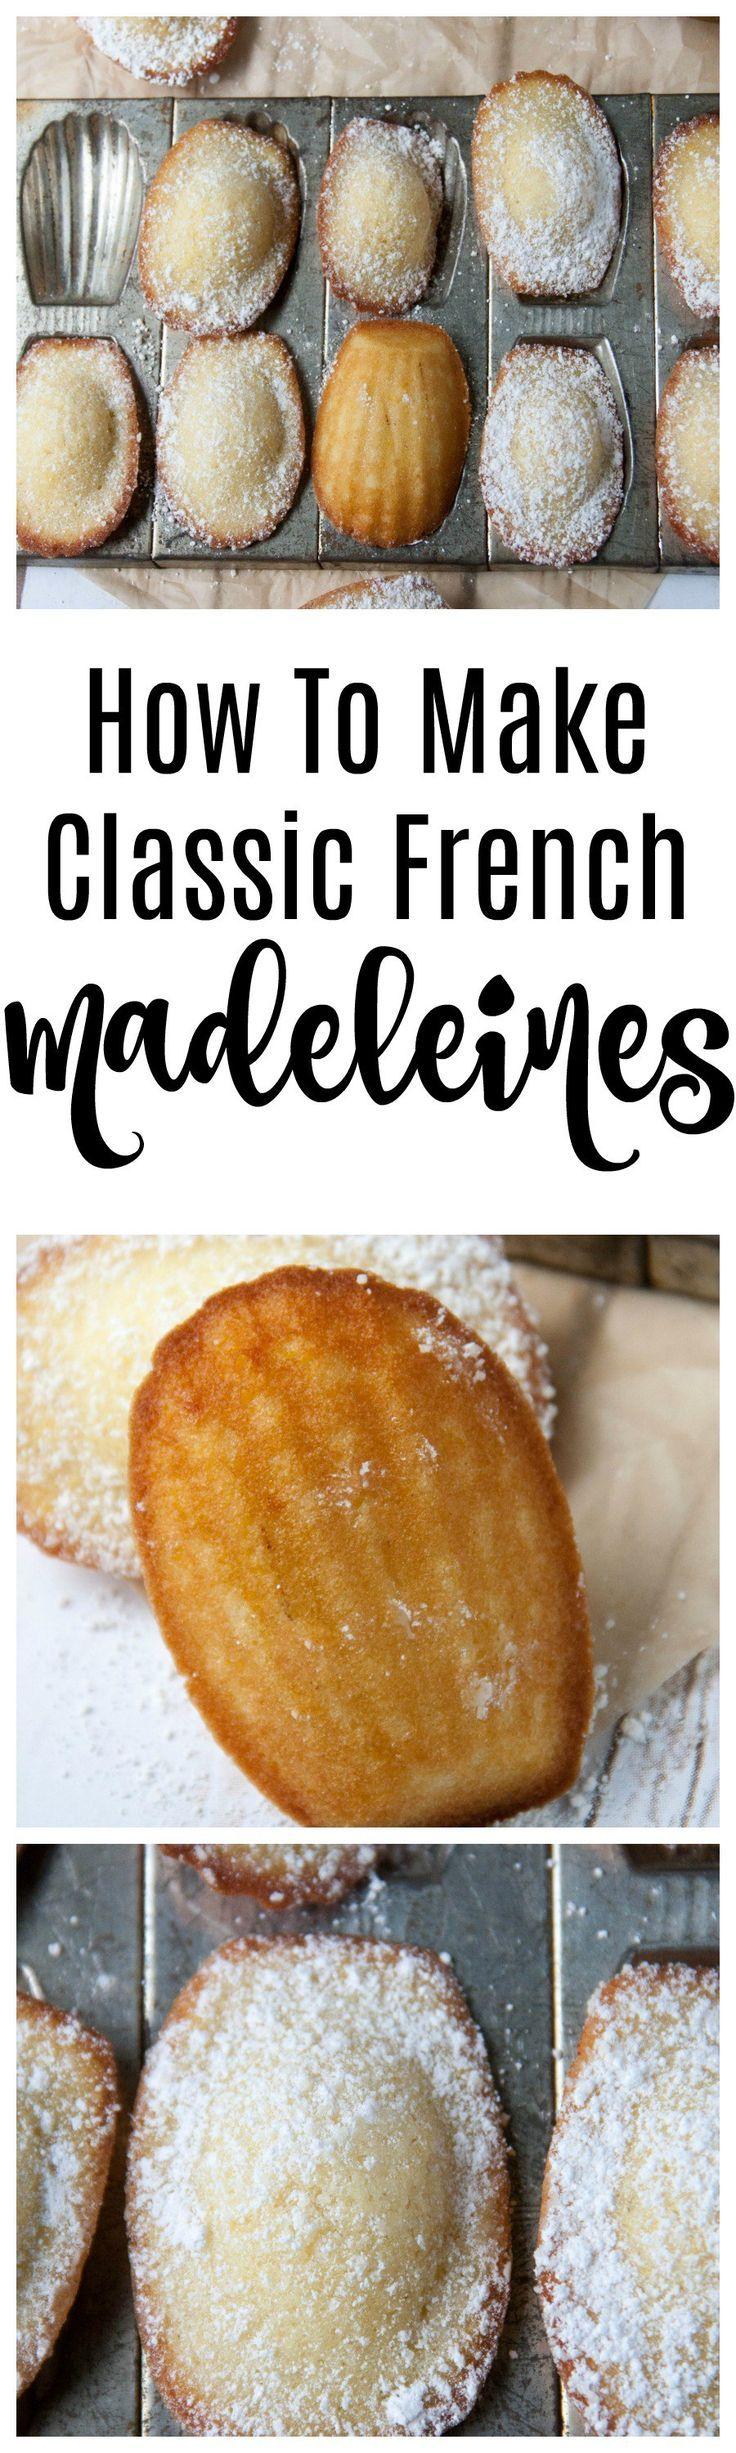 How To Make French Madeleines   madeleines   french madeleines   madeleine cookies   madeleine cakes   french cakes   french cookies   french desserts   how to make madeleines